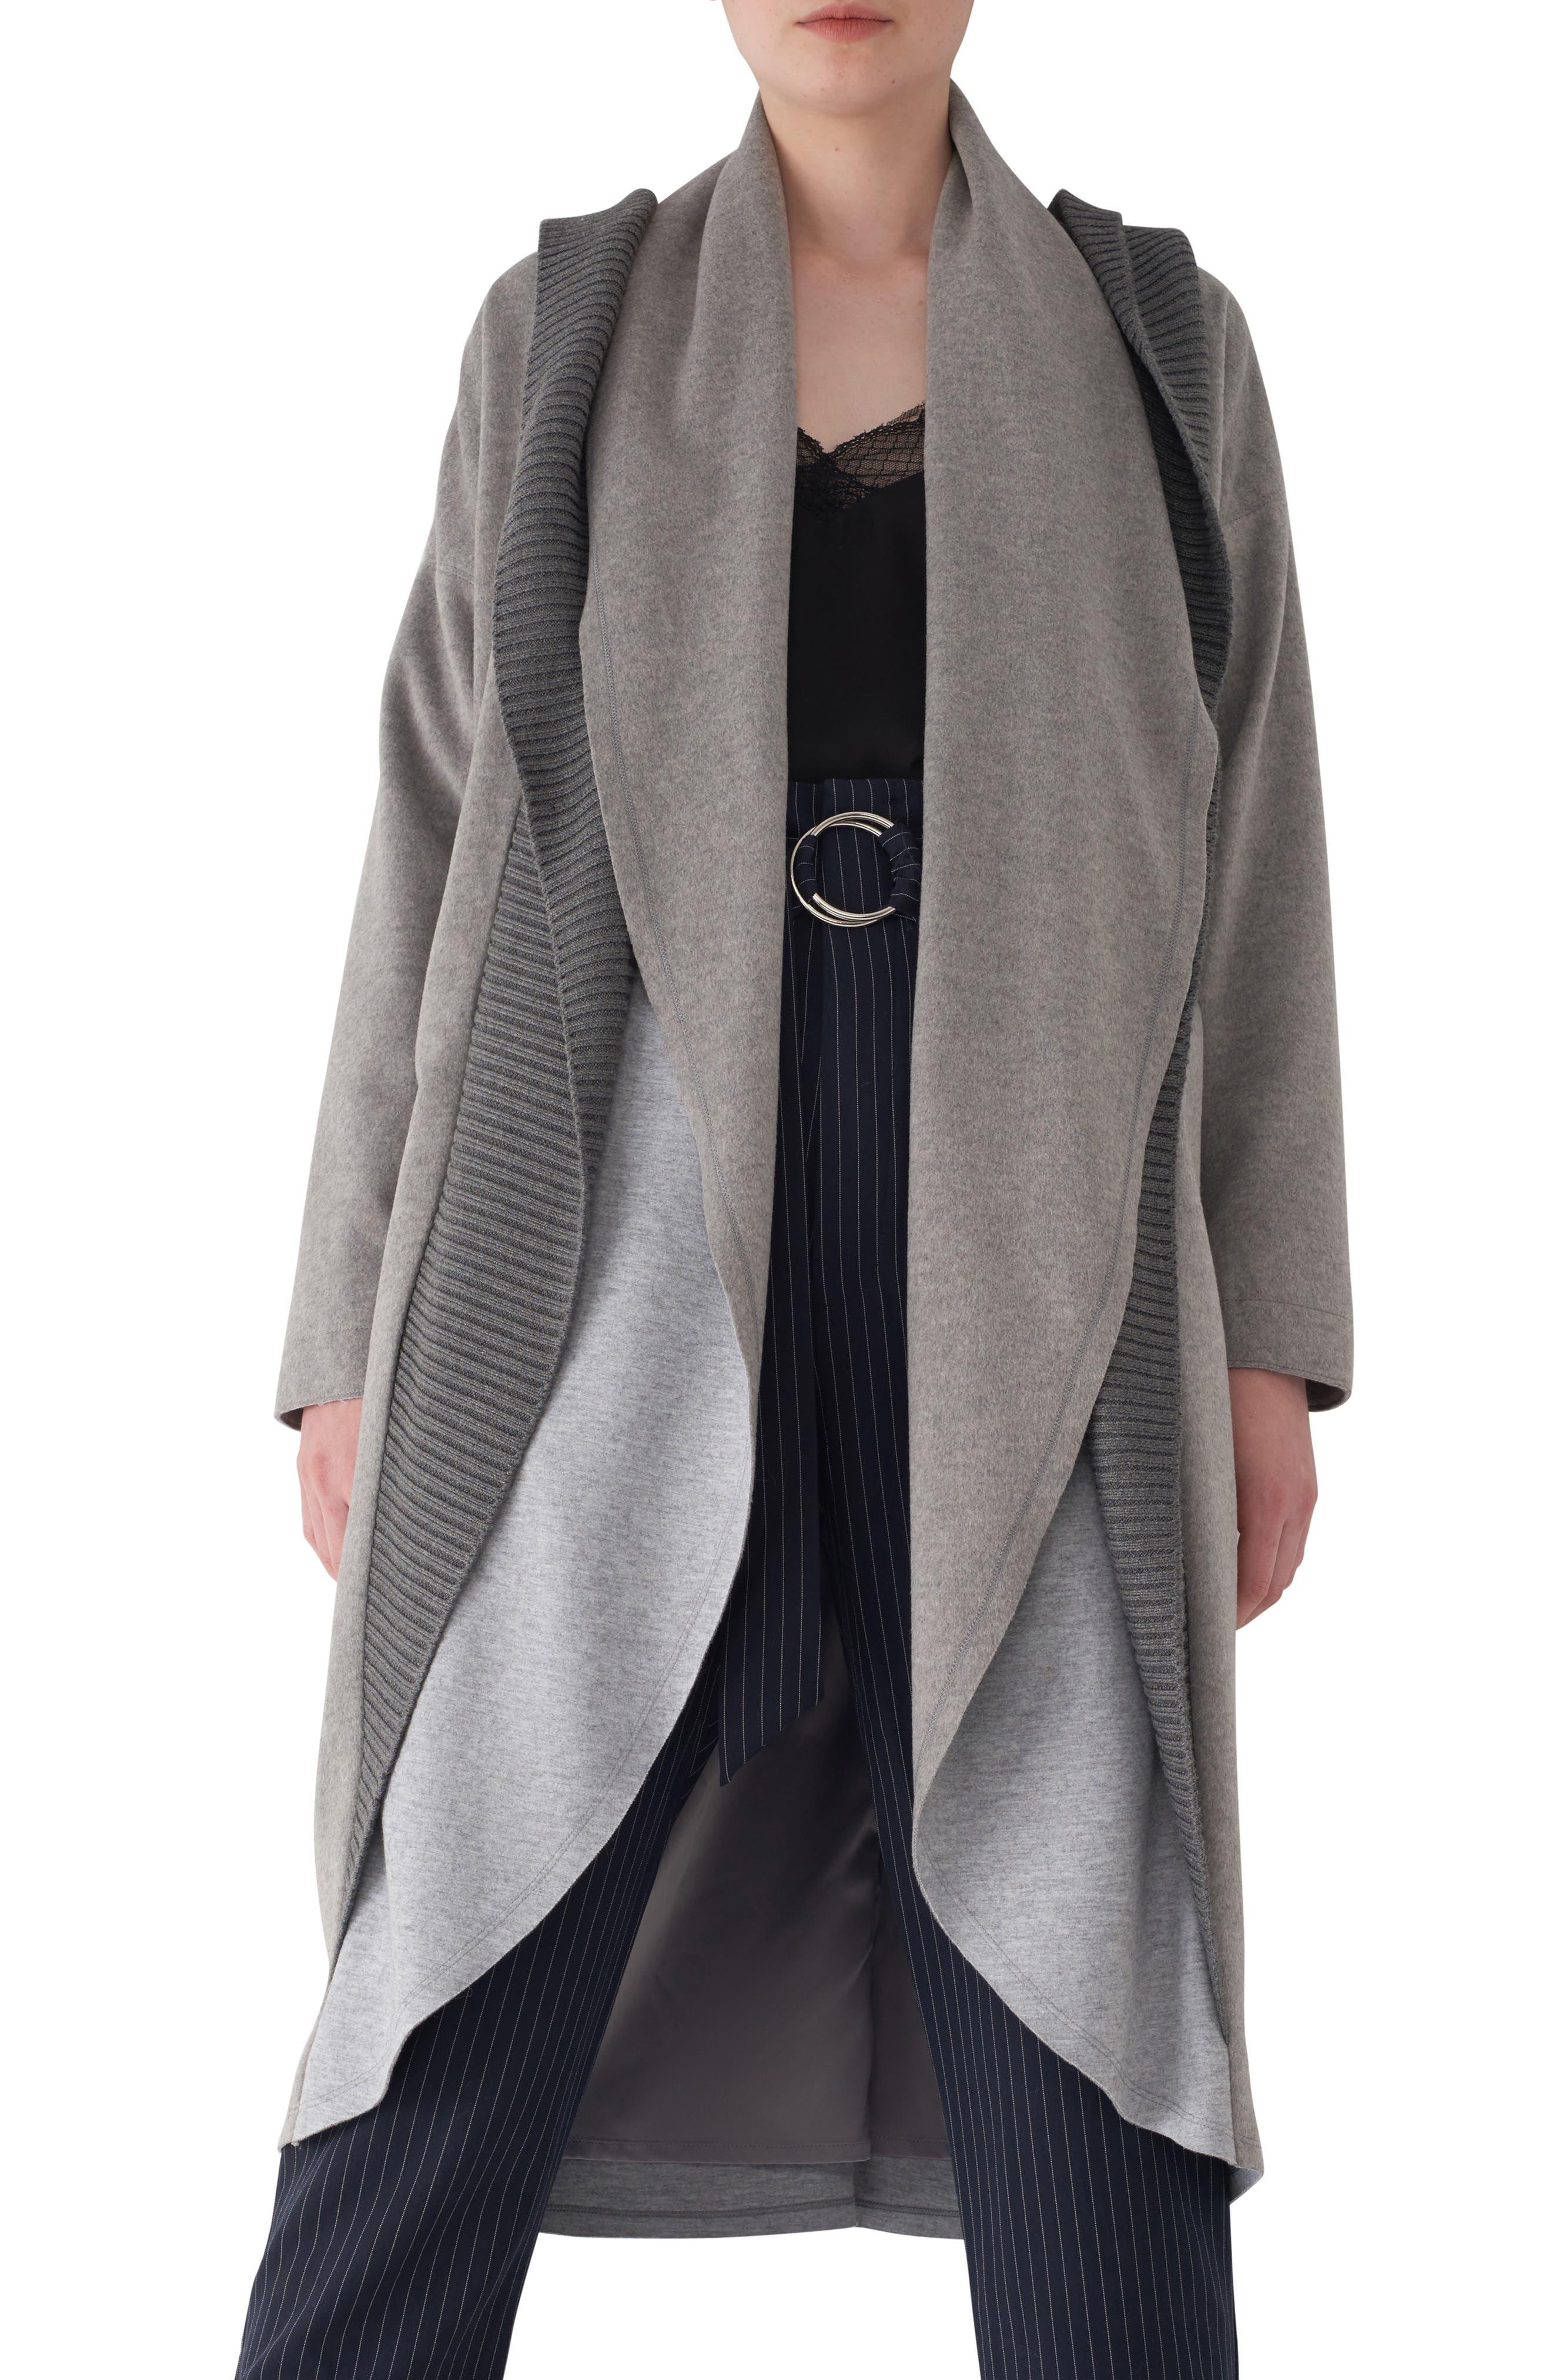 Brandy Stone Grey Duster Coat,                             Main thumbnail 1, color,                             GREY